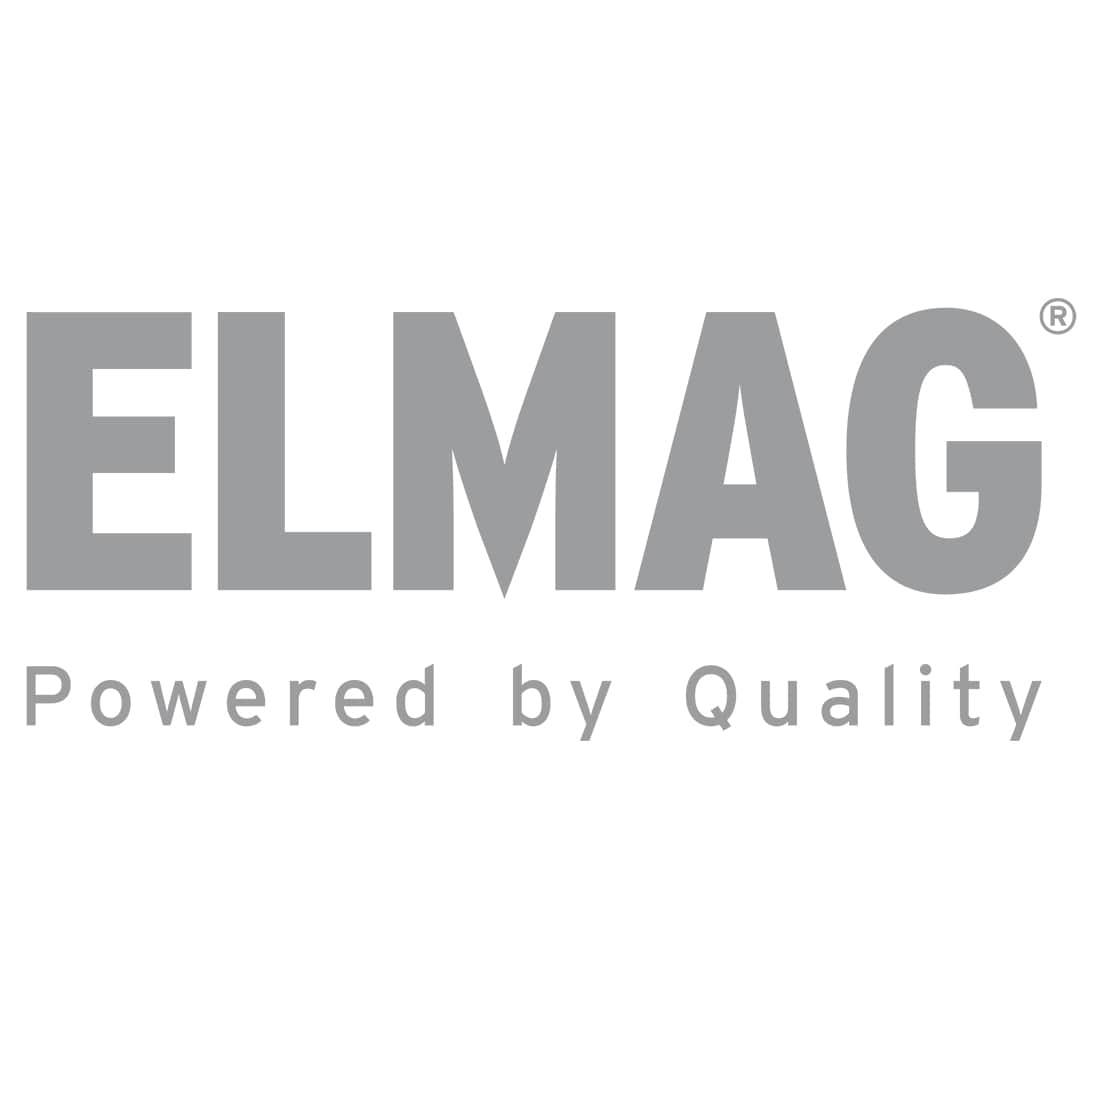 Welding inverter PUMA 1501 PFC - Eco Set